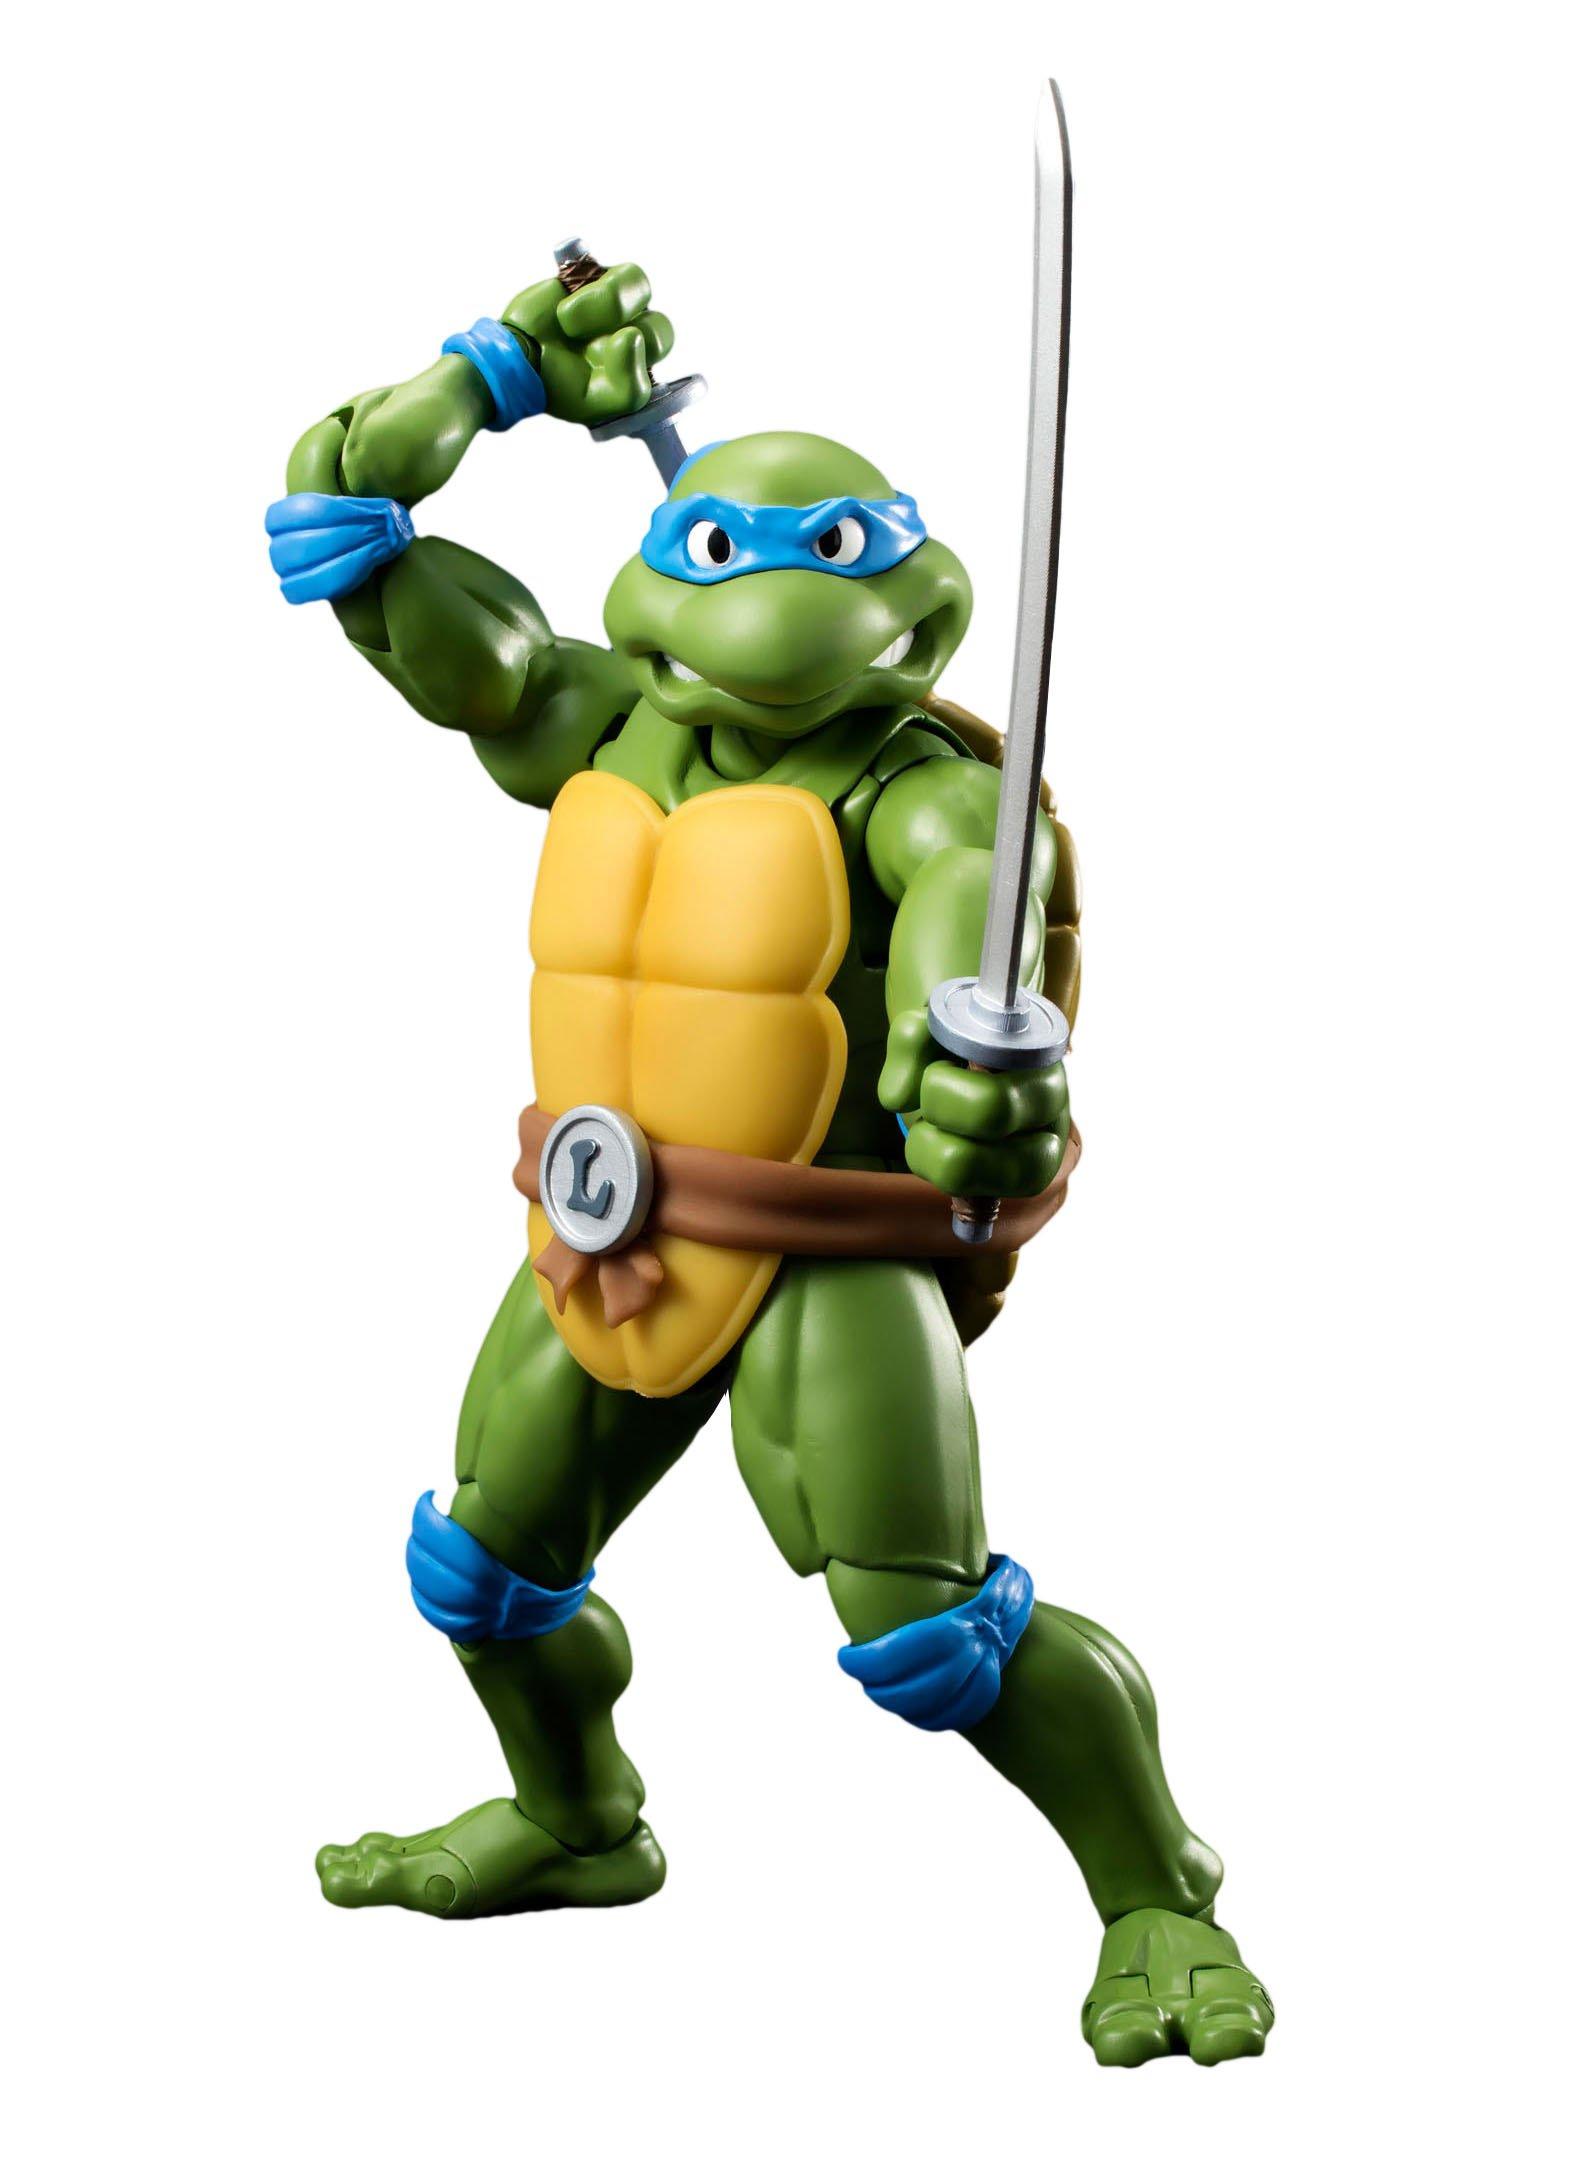 Bandai Tamashii Nations S.H. Figuarts Leonardo ''Teenage Mutant Ninja Turtles'' Action Figure